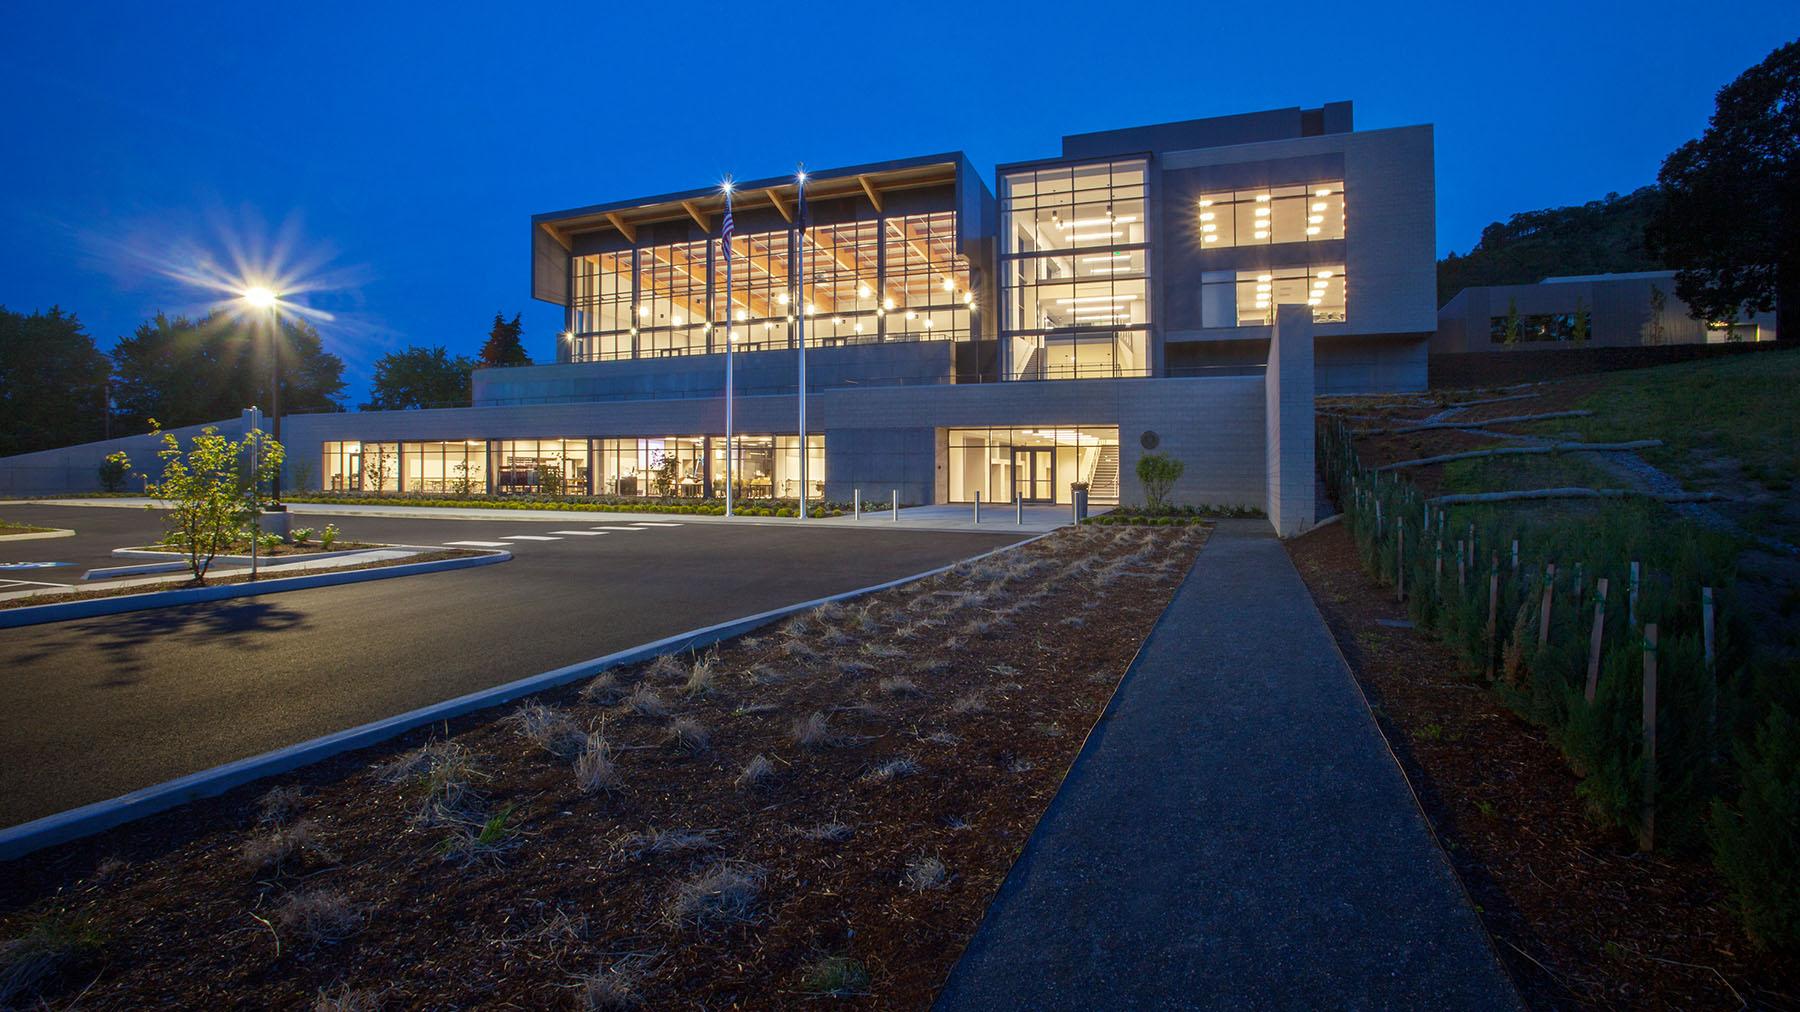 Oregon Military Department The Dalles Readiness Center, Glumac MEP Engineering